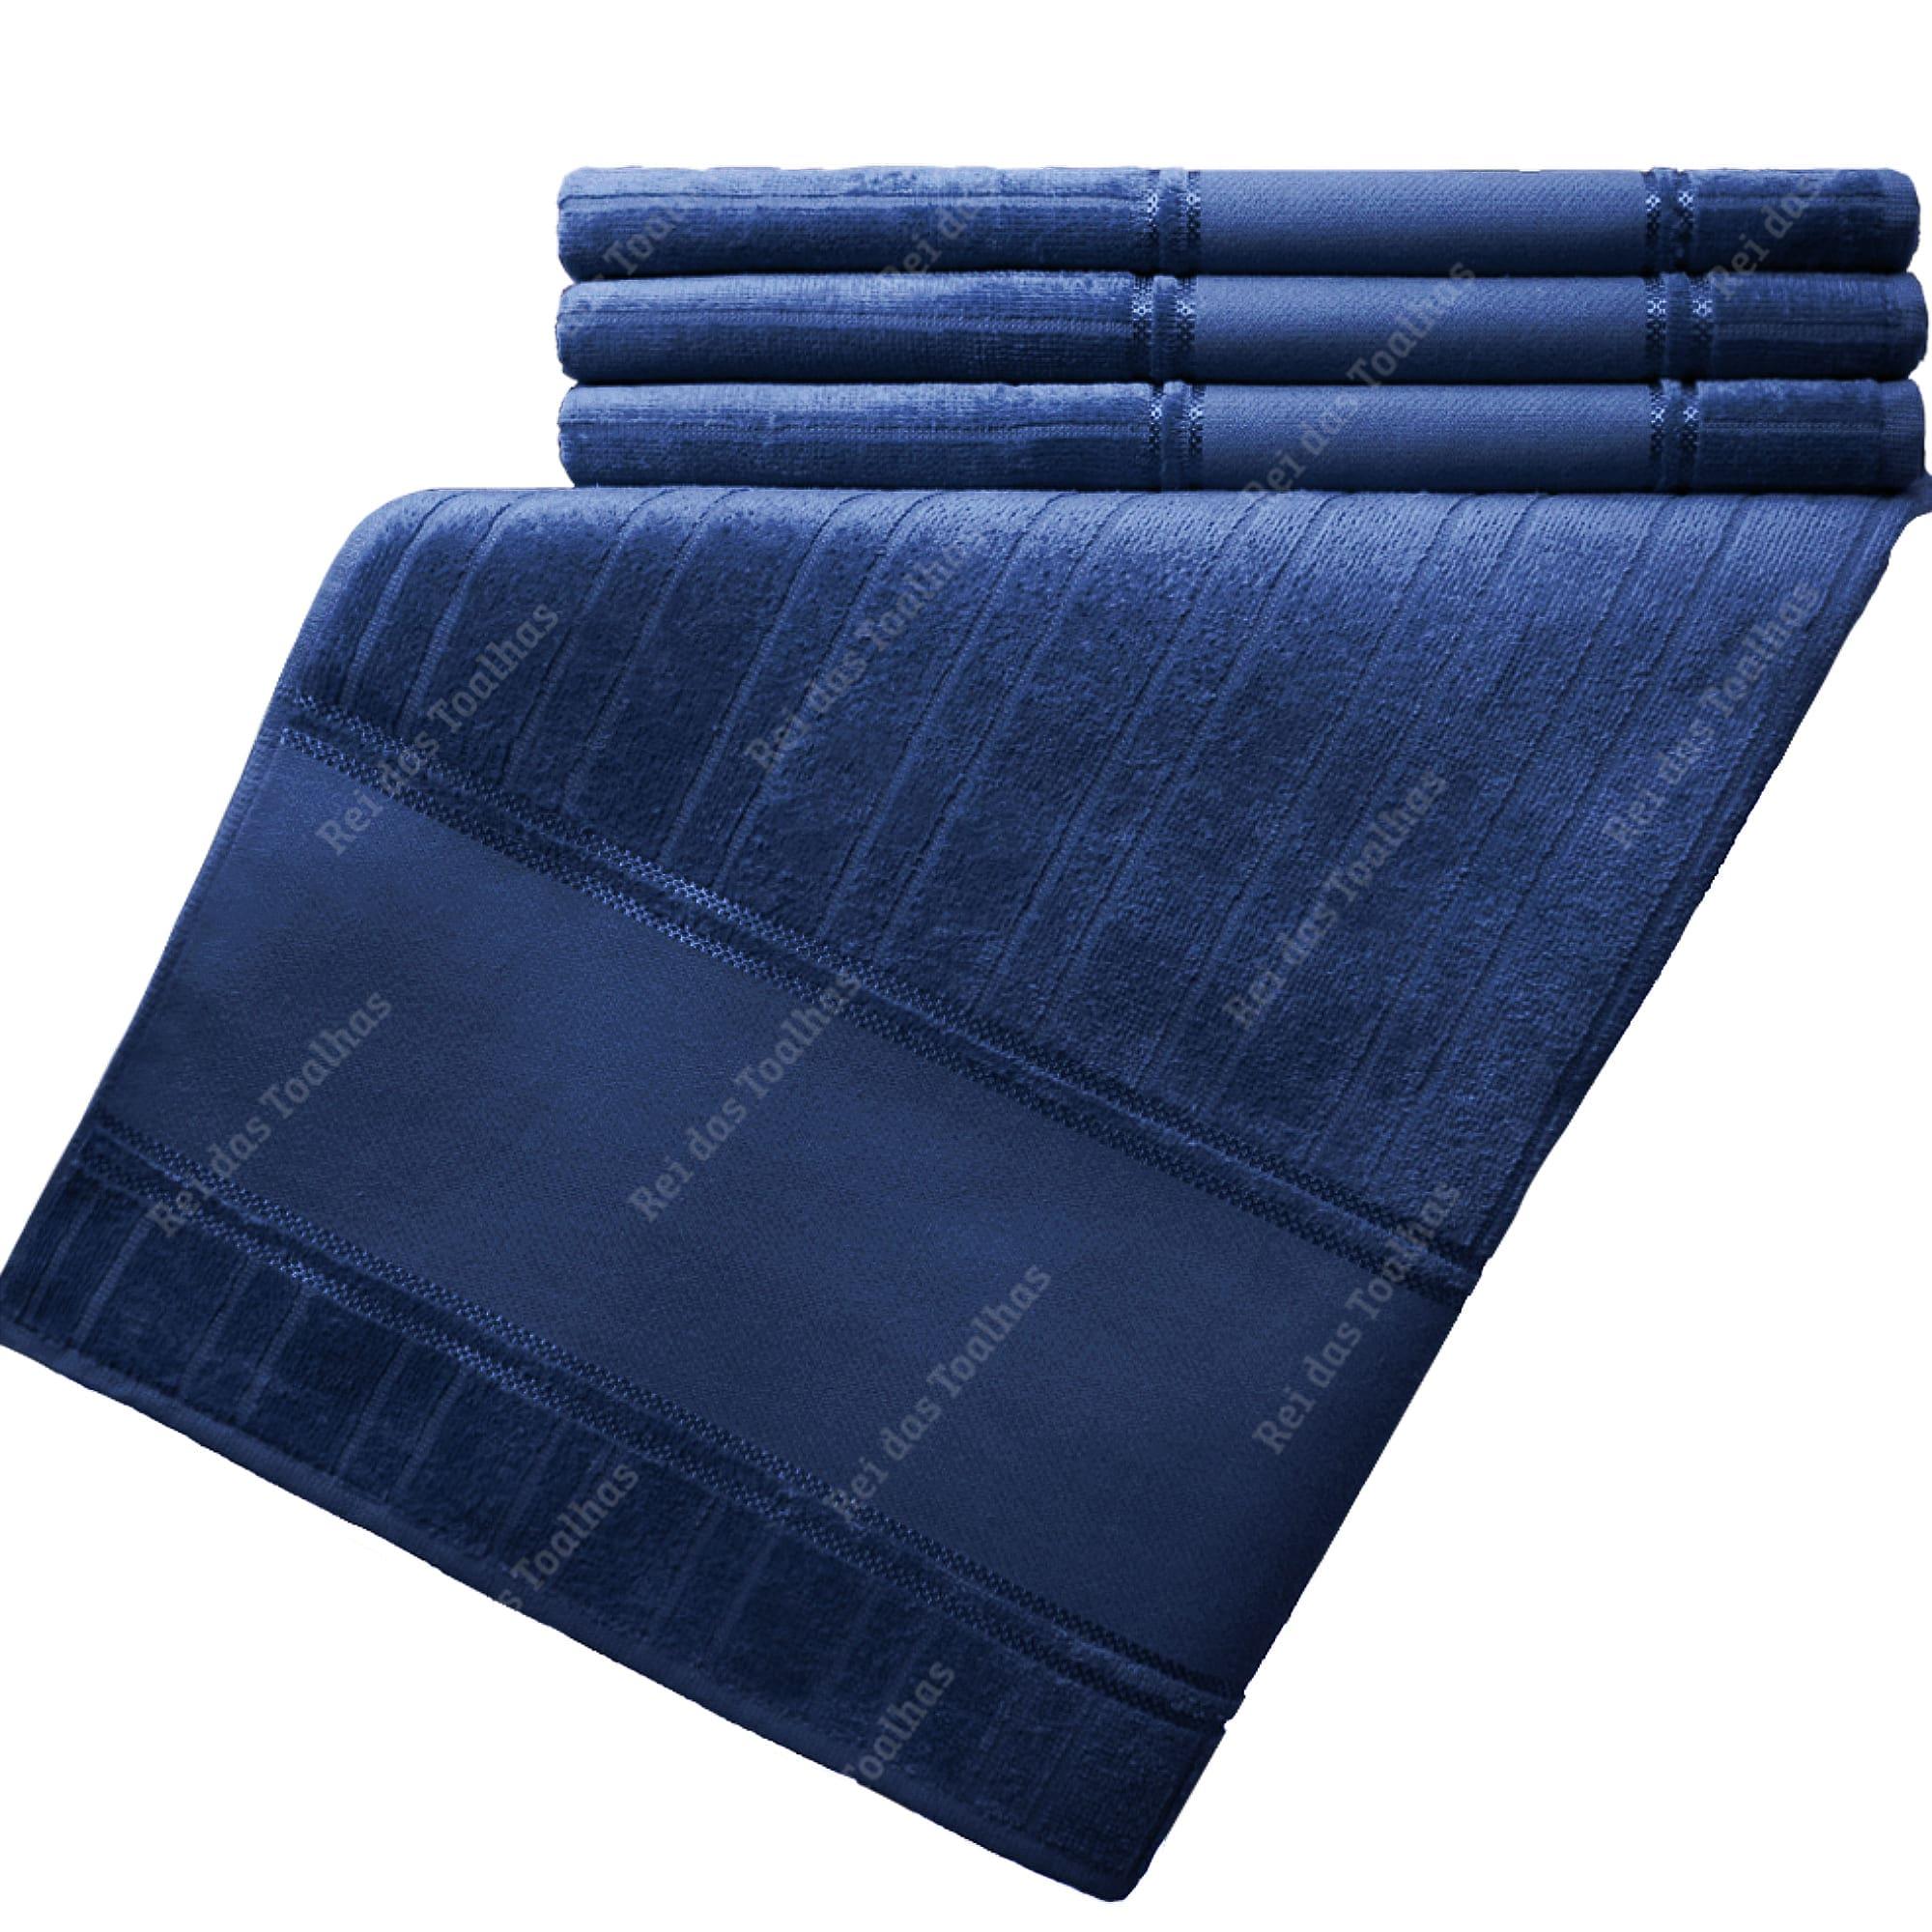 Kit Com 03 Toalhas De Banho Para Pintar Velour Artesanalle 70X140cm DOHLER